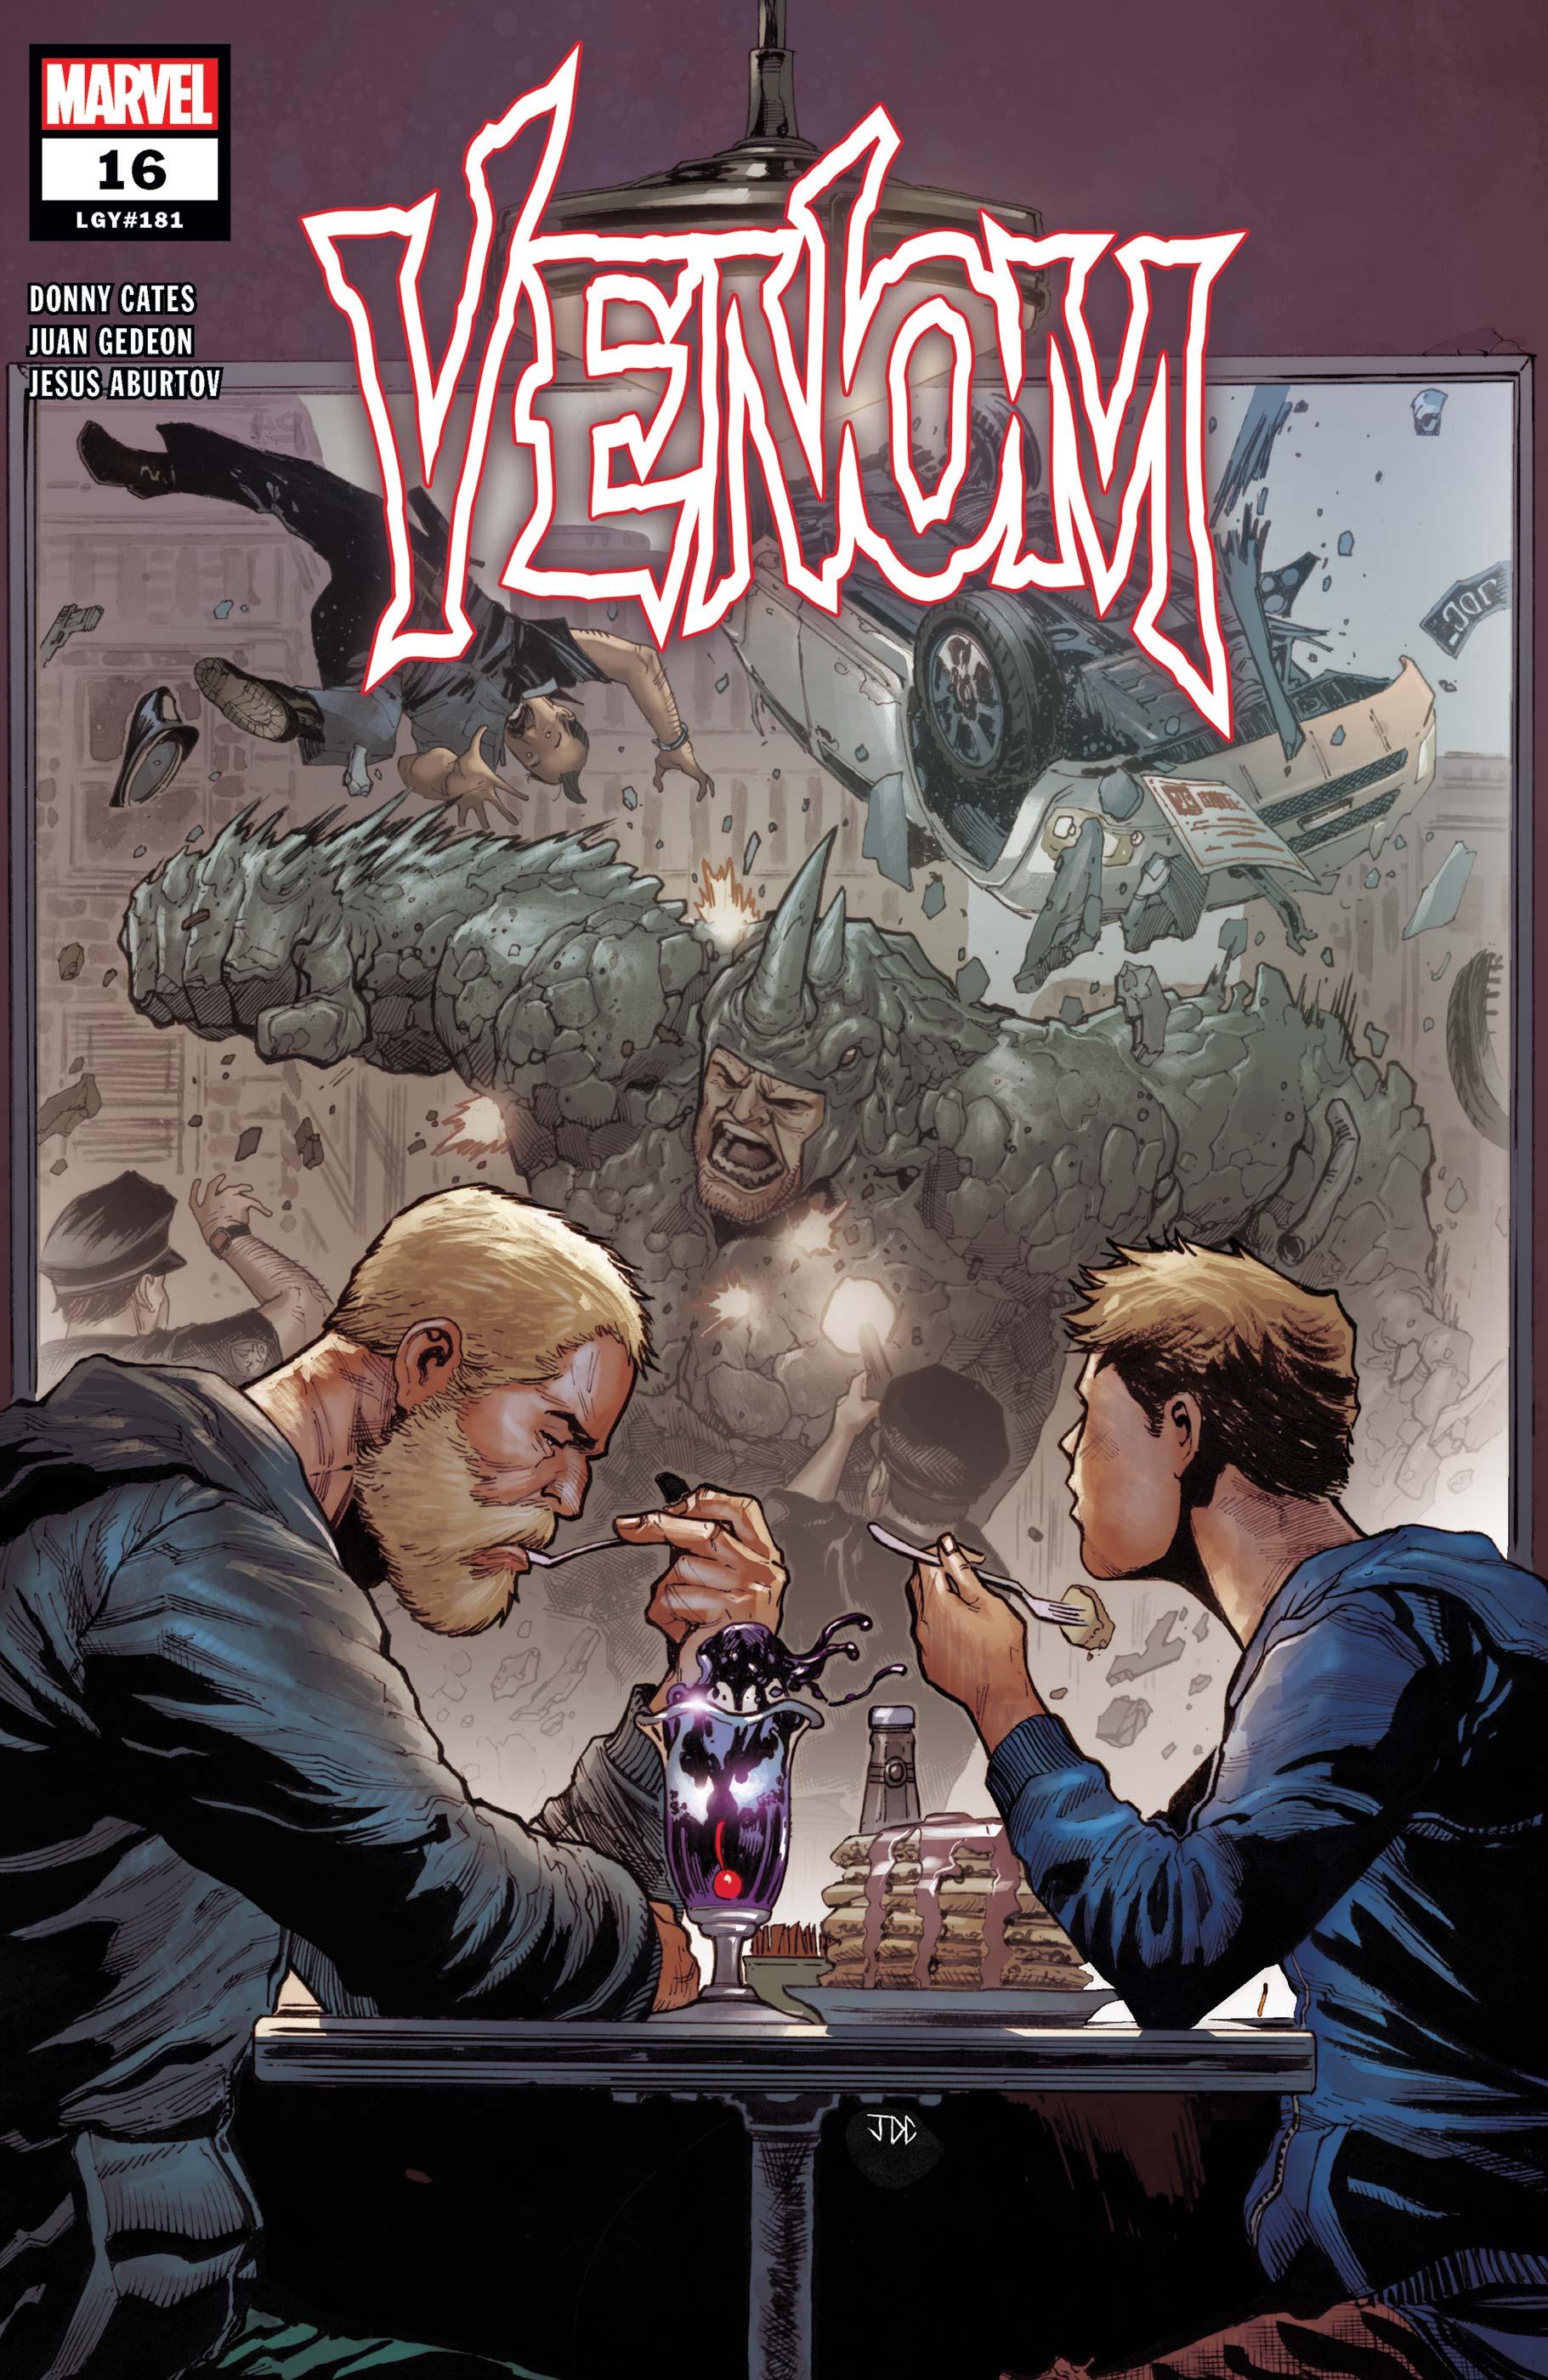 Venom (2018) #16